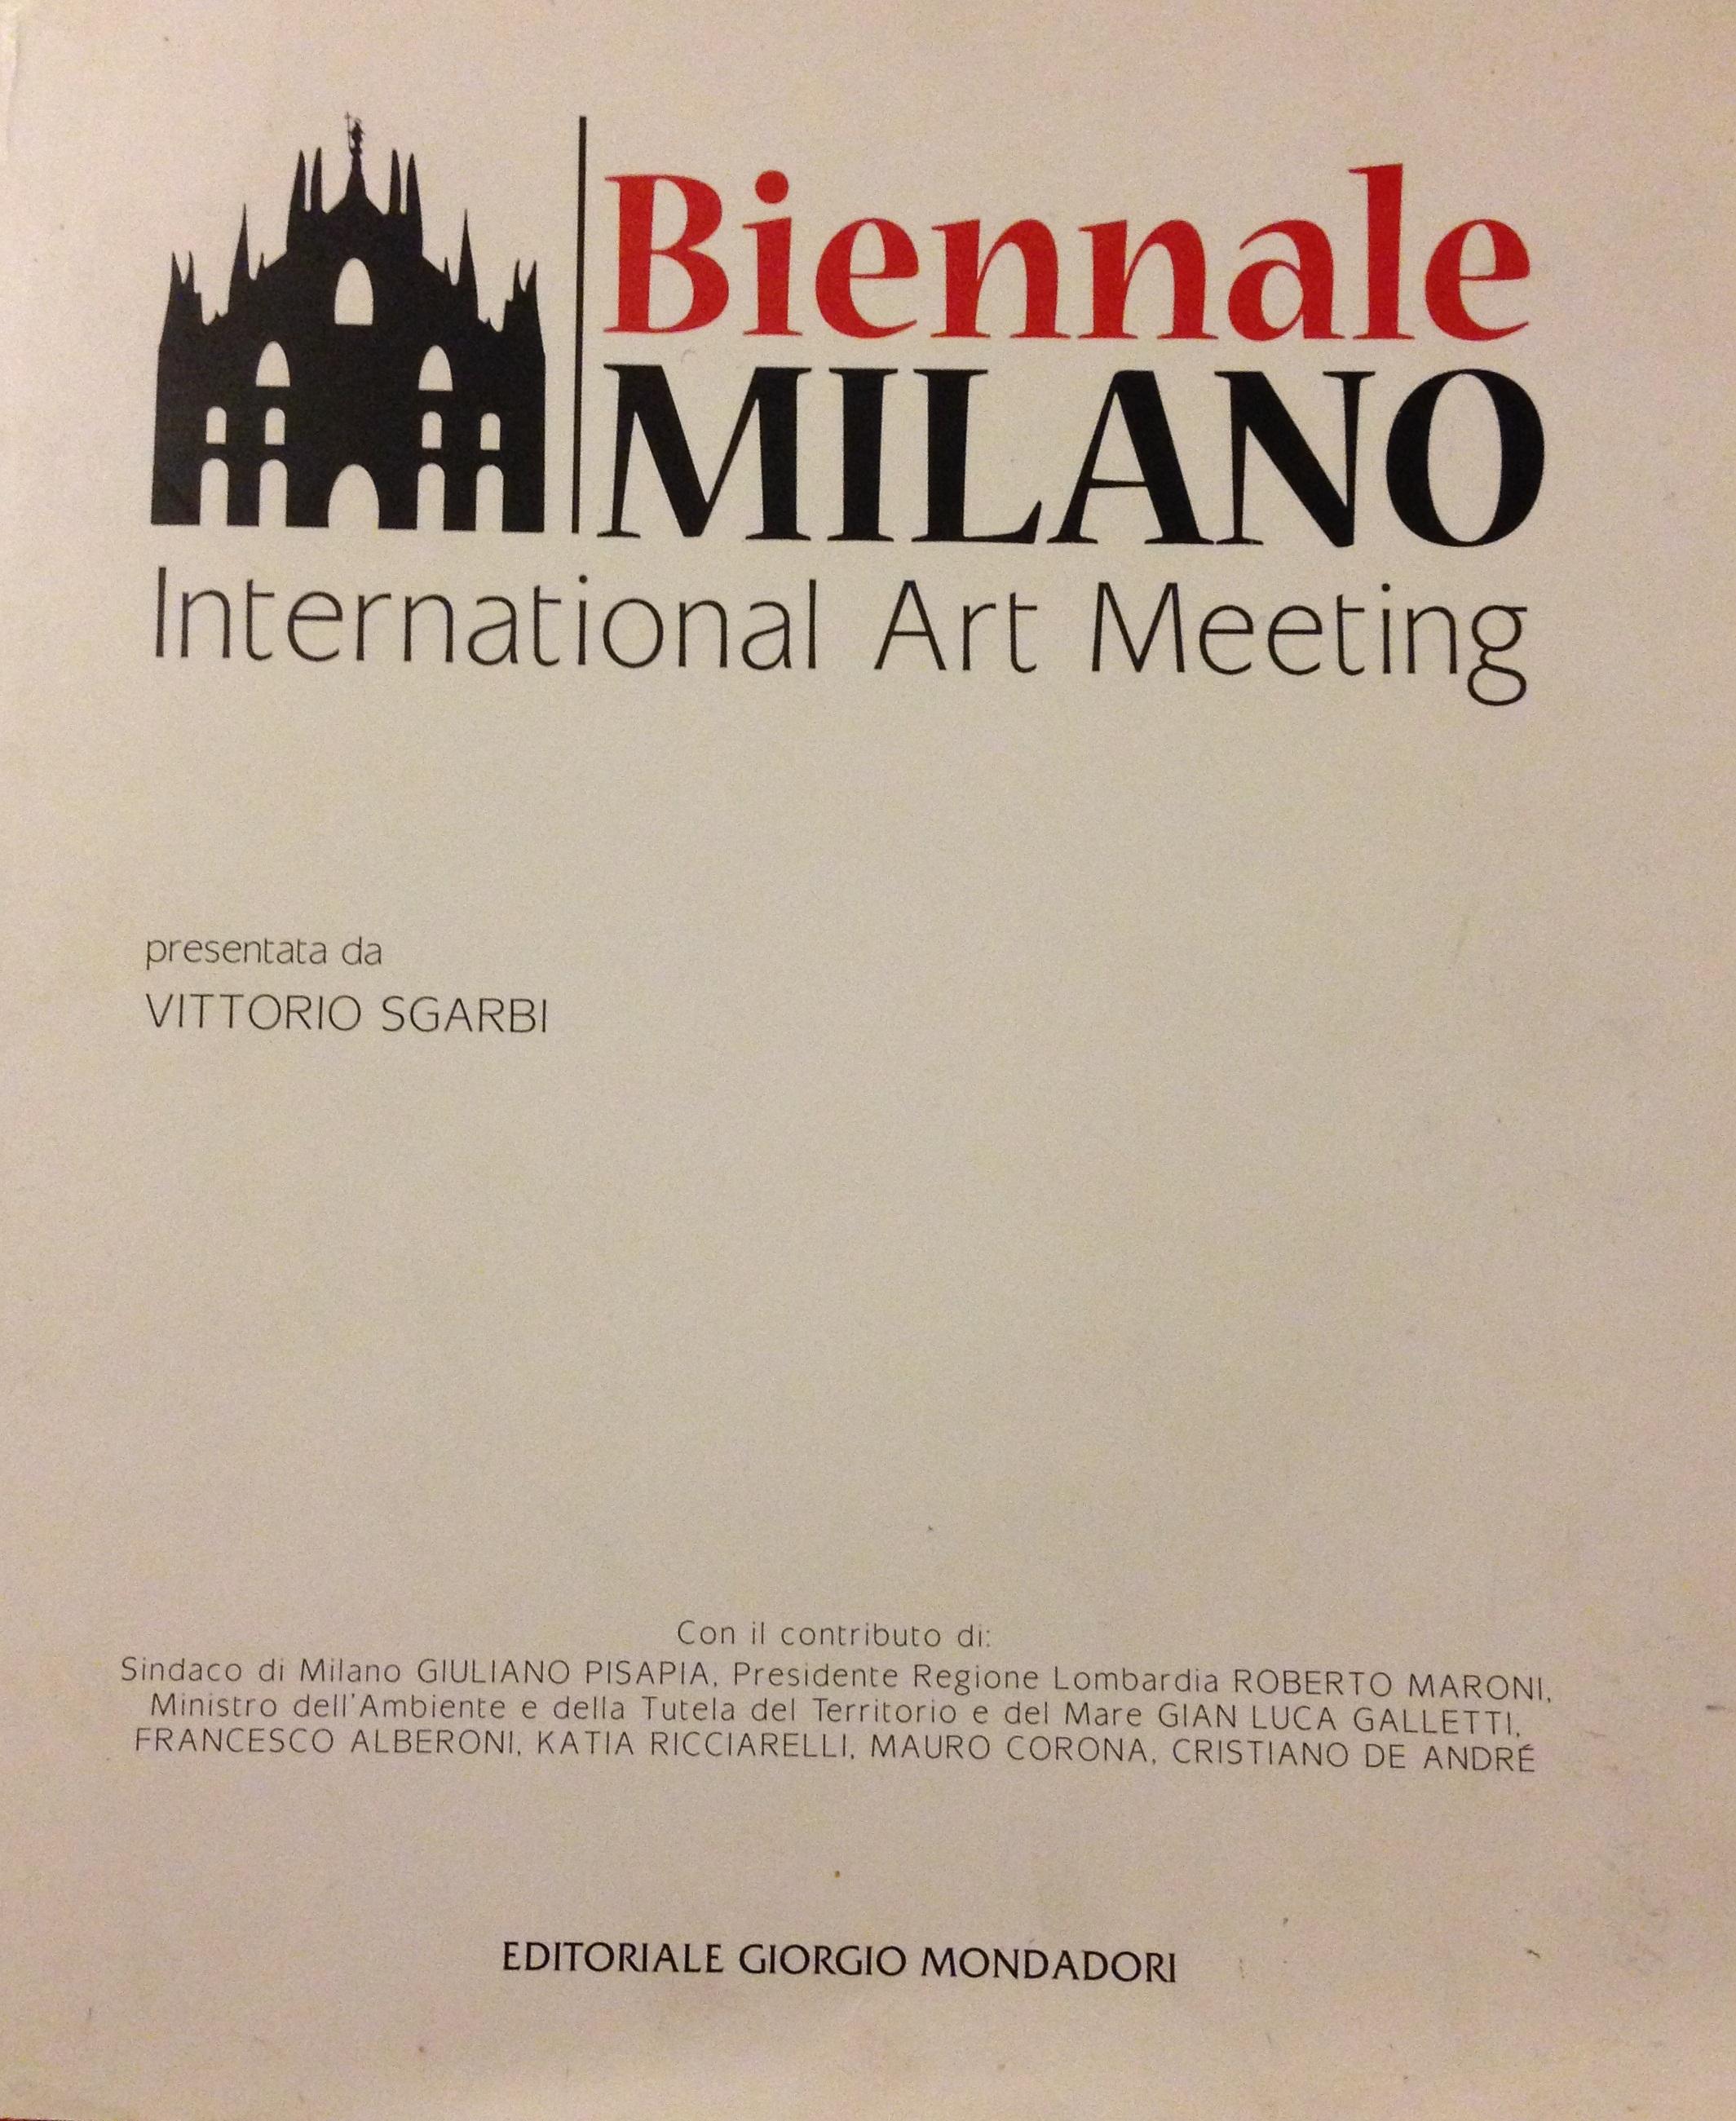 Biennale Milano 2015 - 1